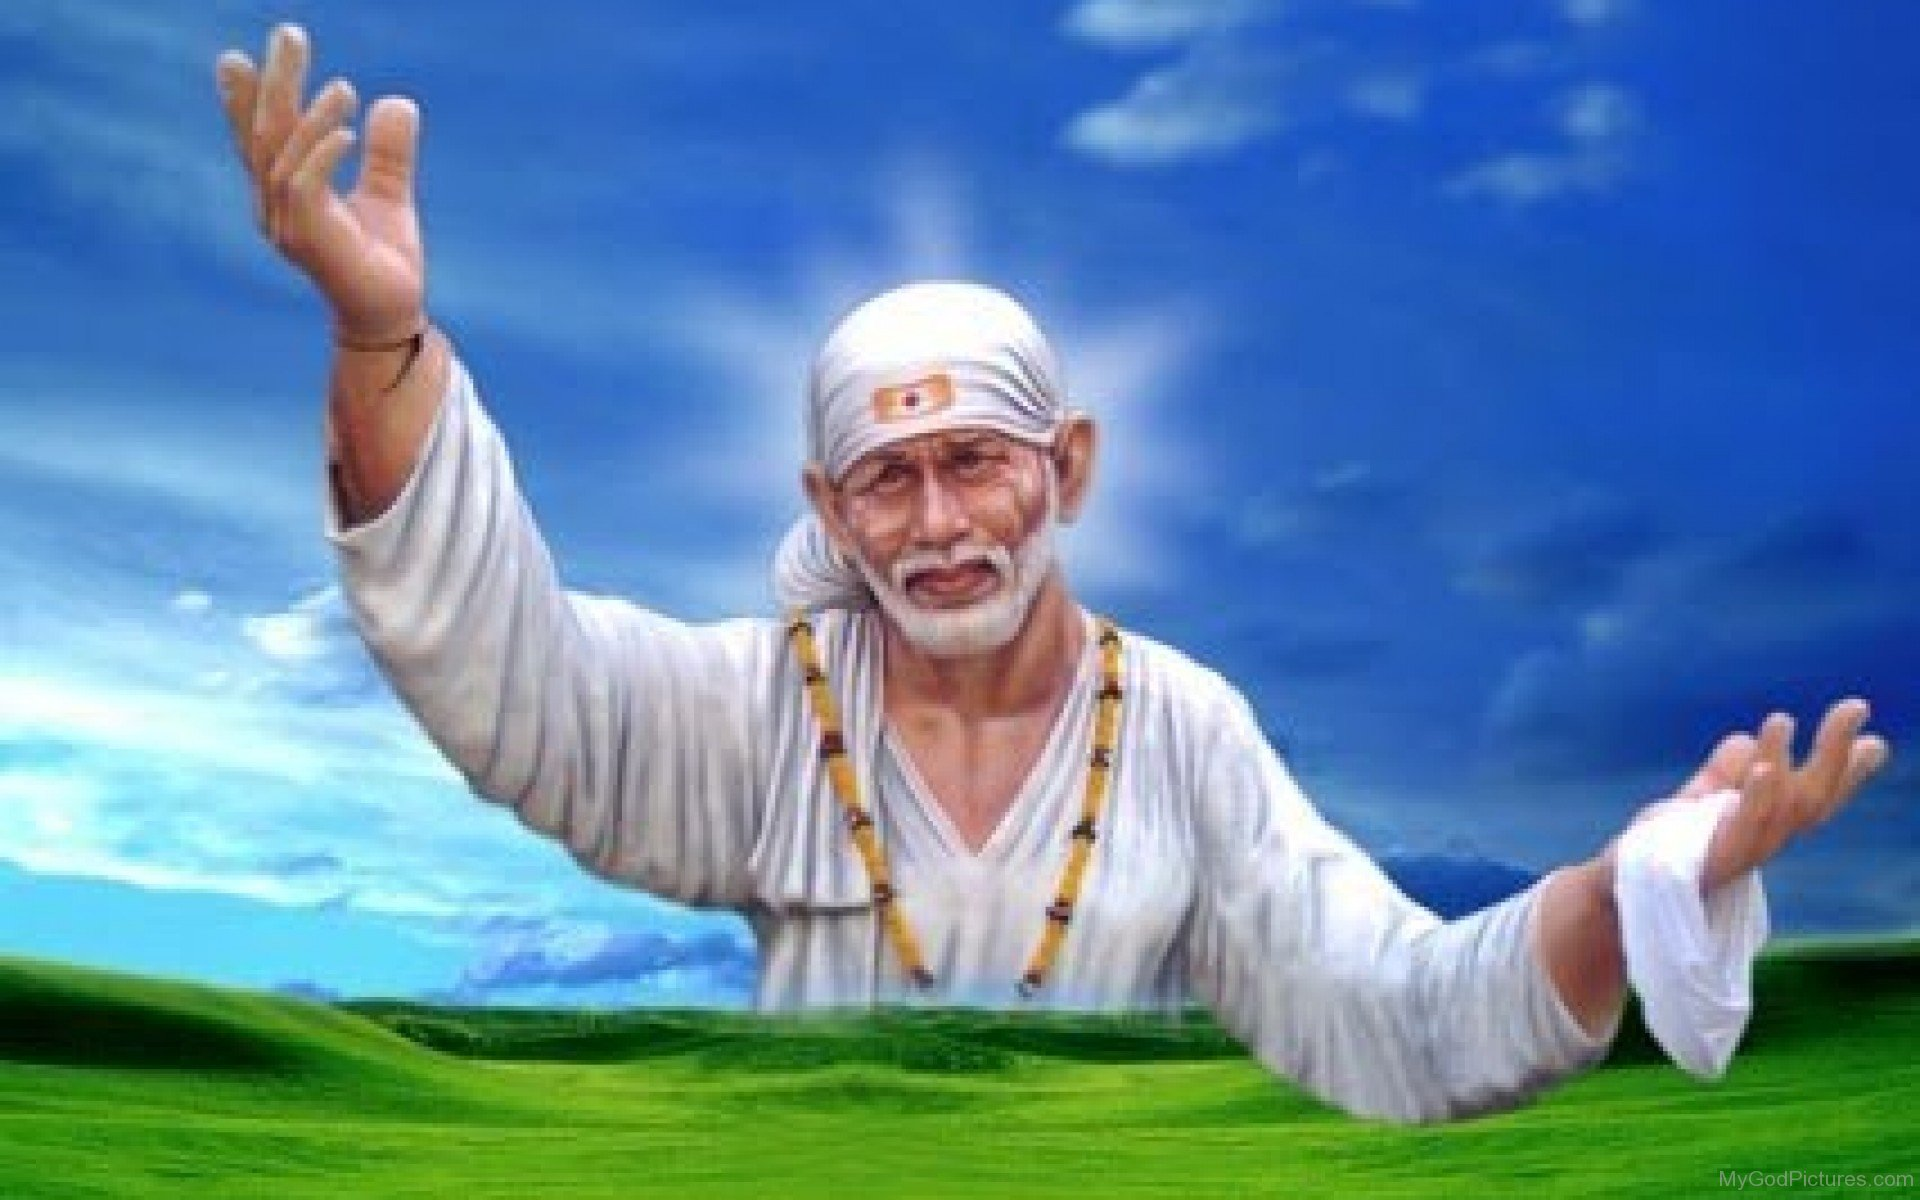 sai baba answers ॐ - (1 miracle) ask shirdi saibaba help